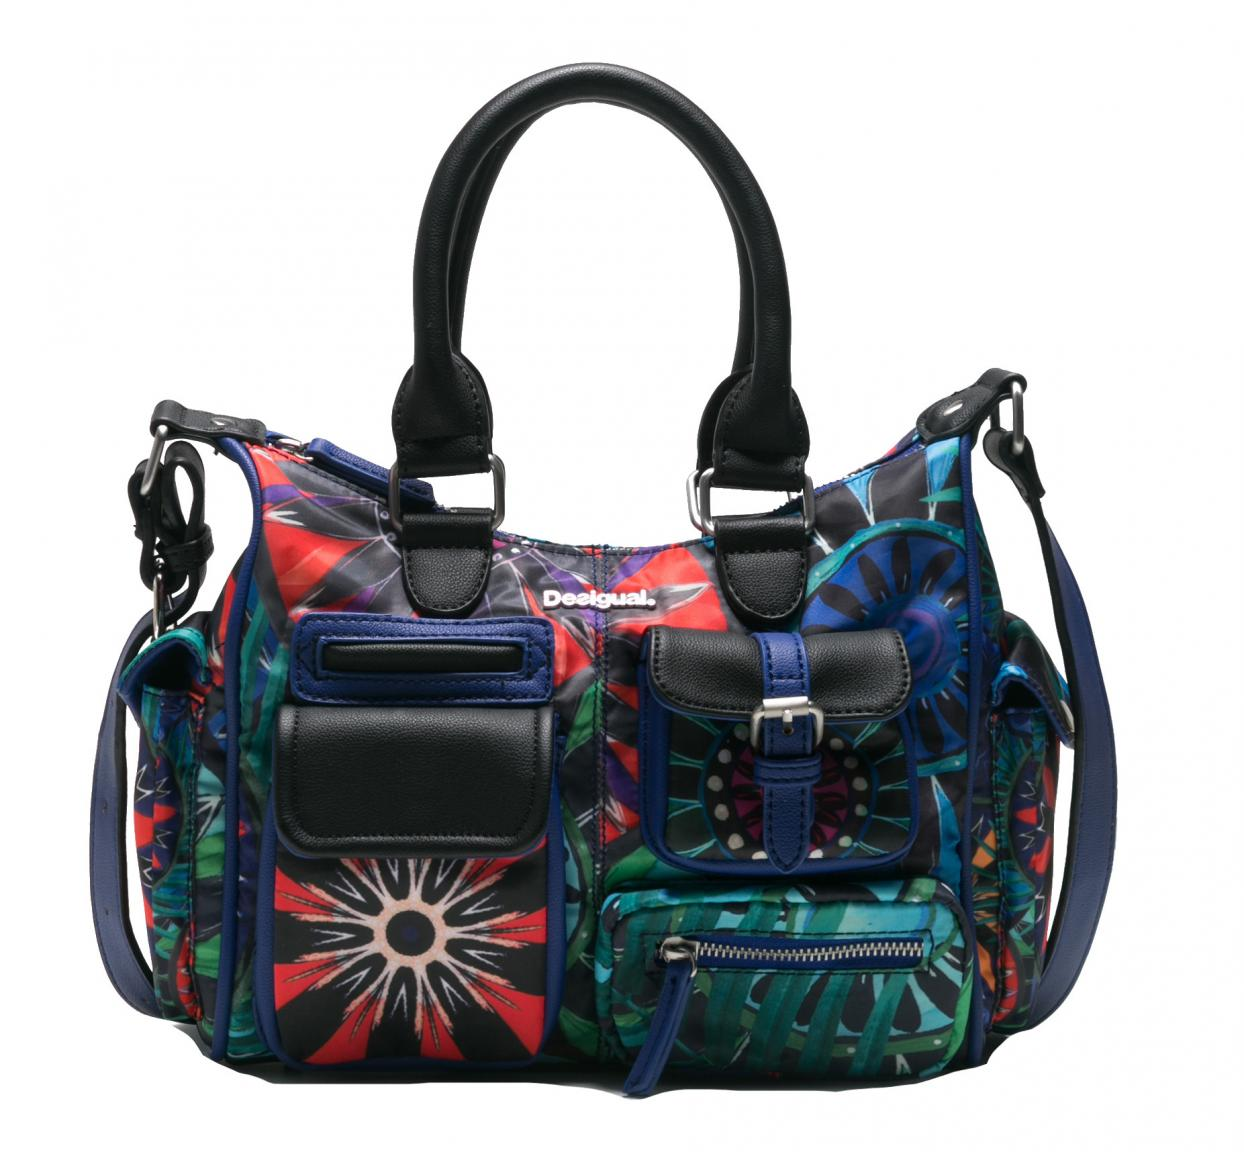 986408543a7e2 Desigual Handtasche Bols Indian Galactic London Mini - Bags   more